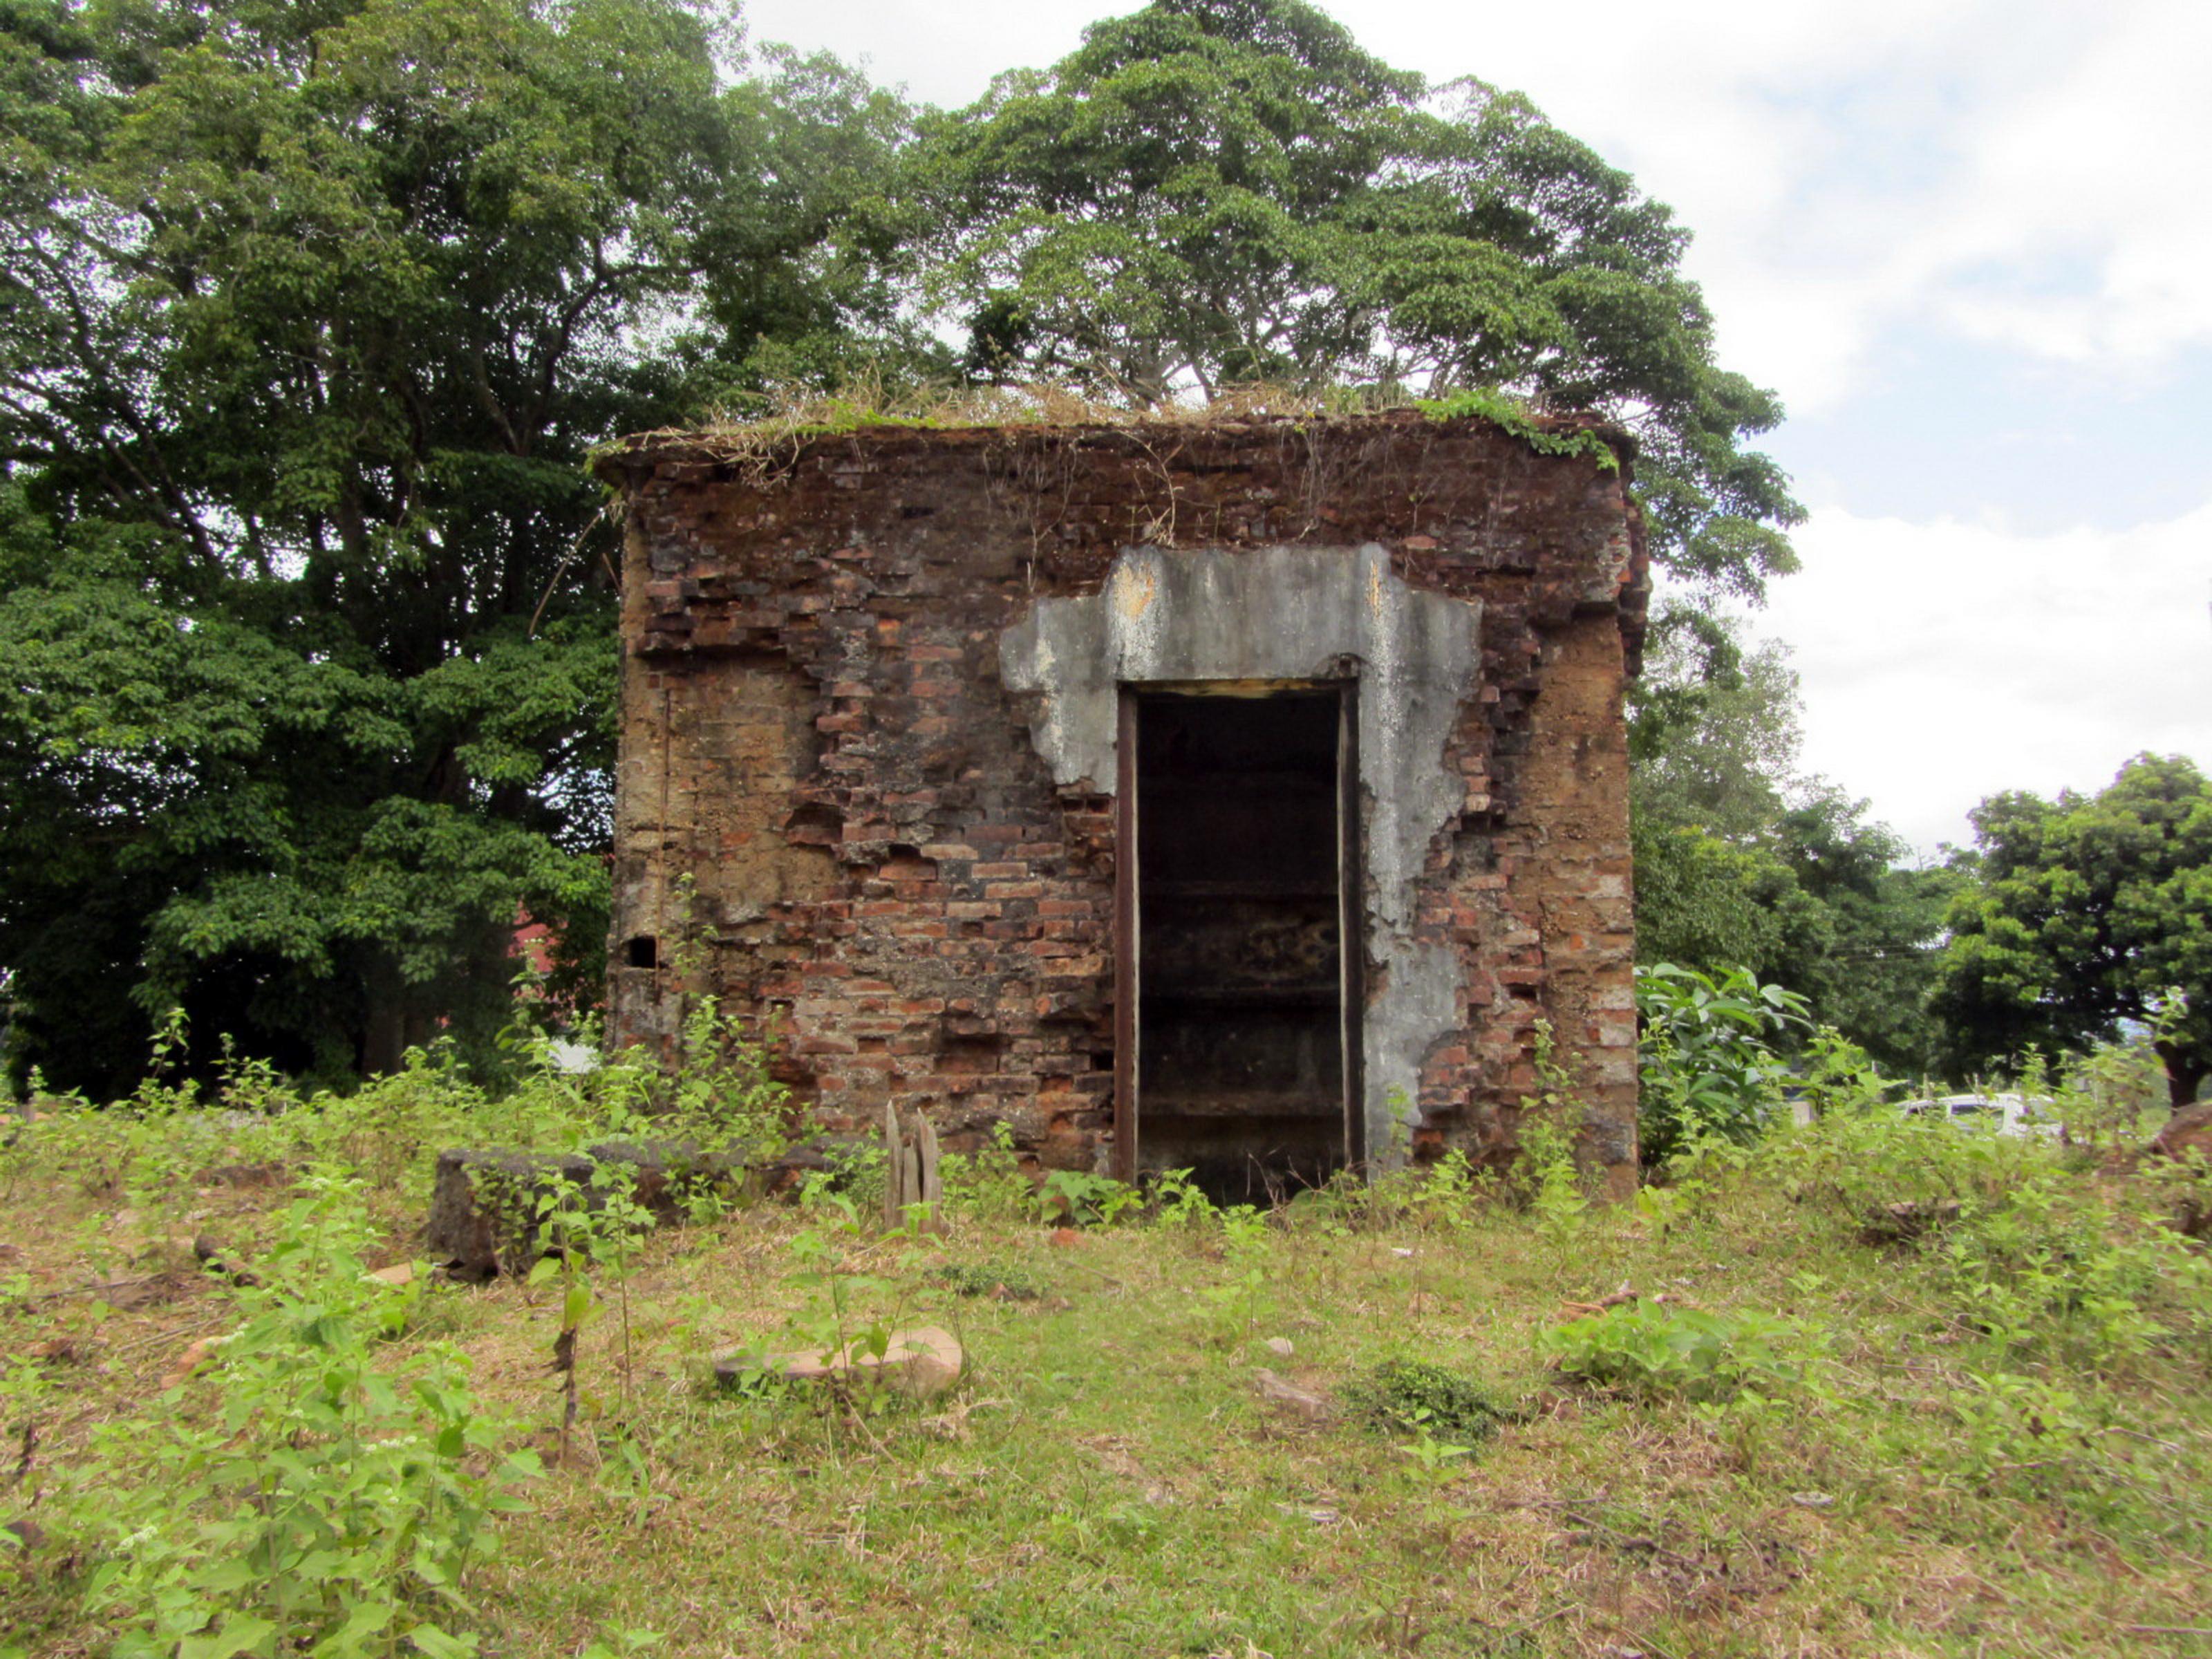 Remnants of the Secret War in Laos